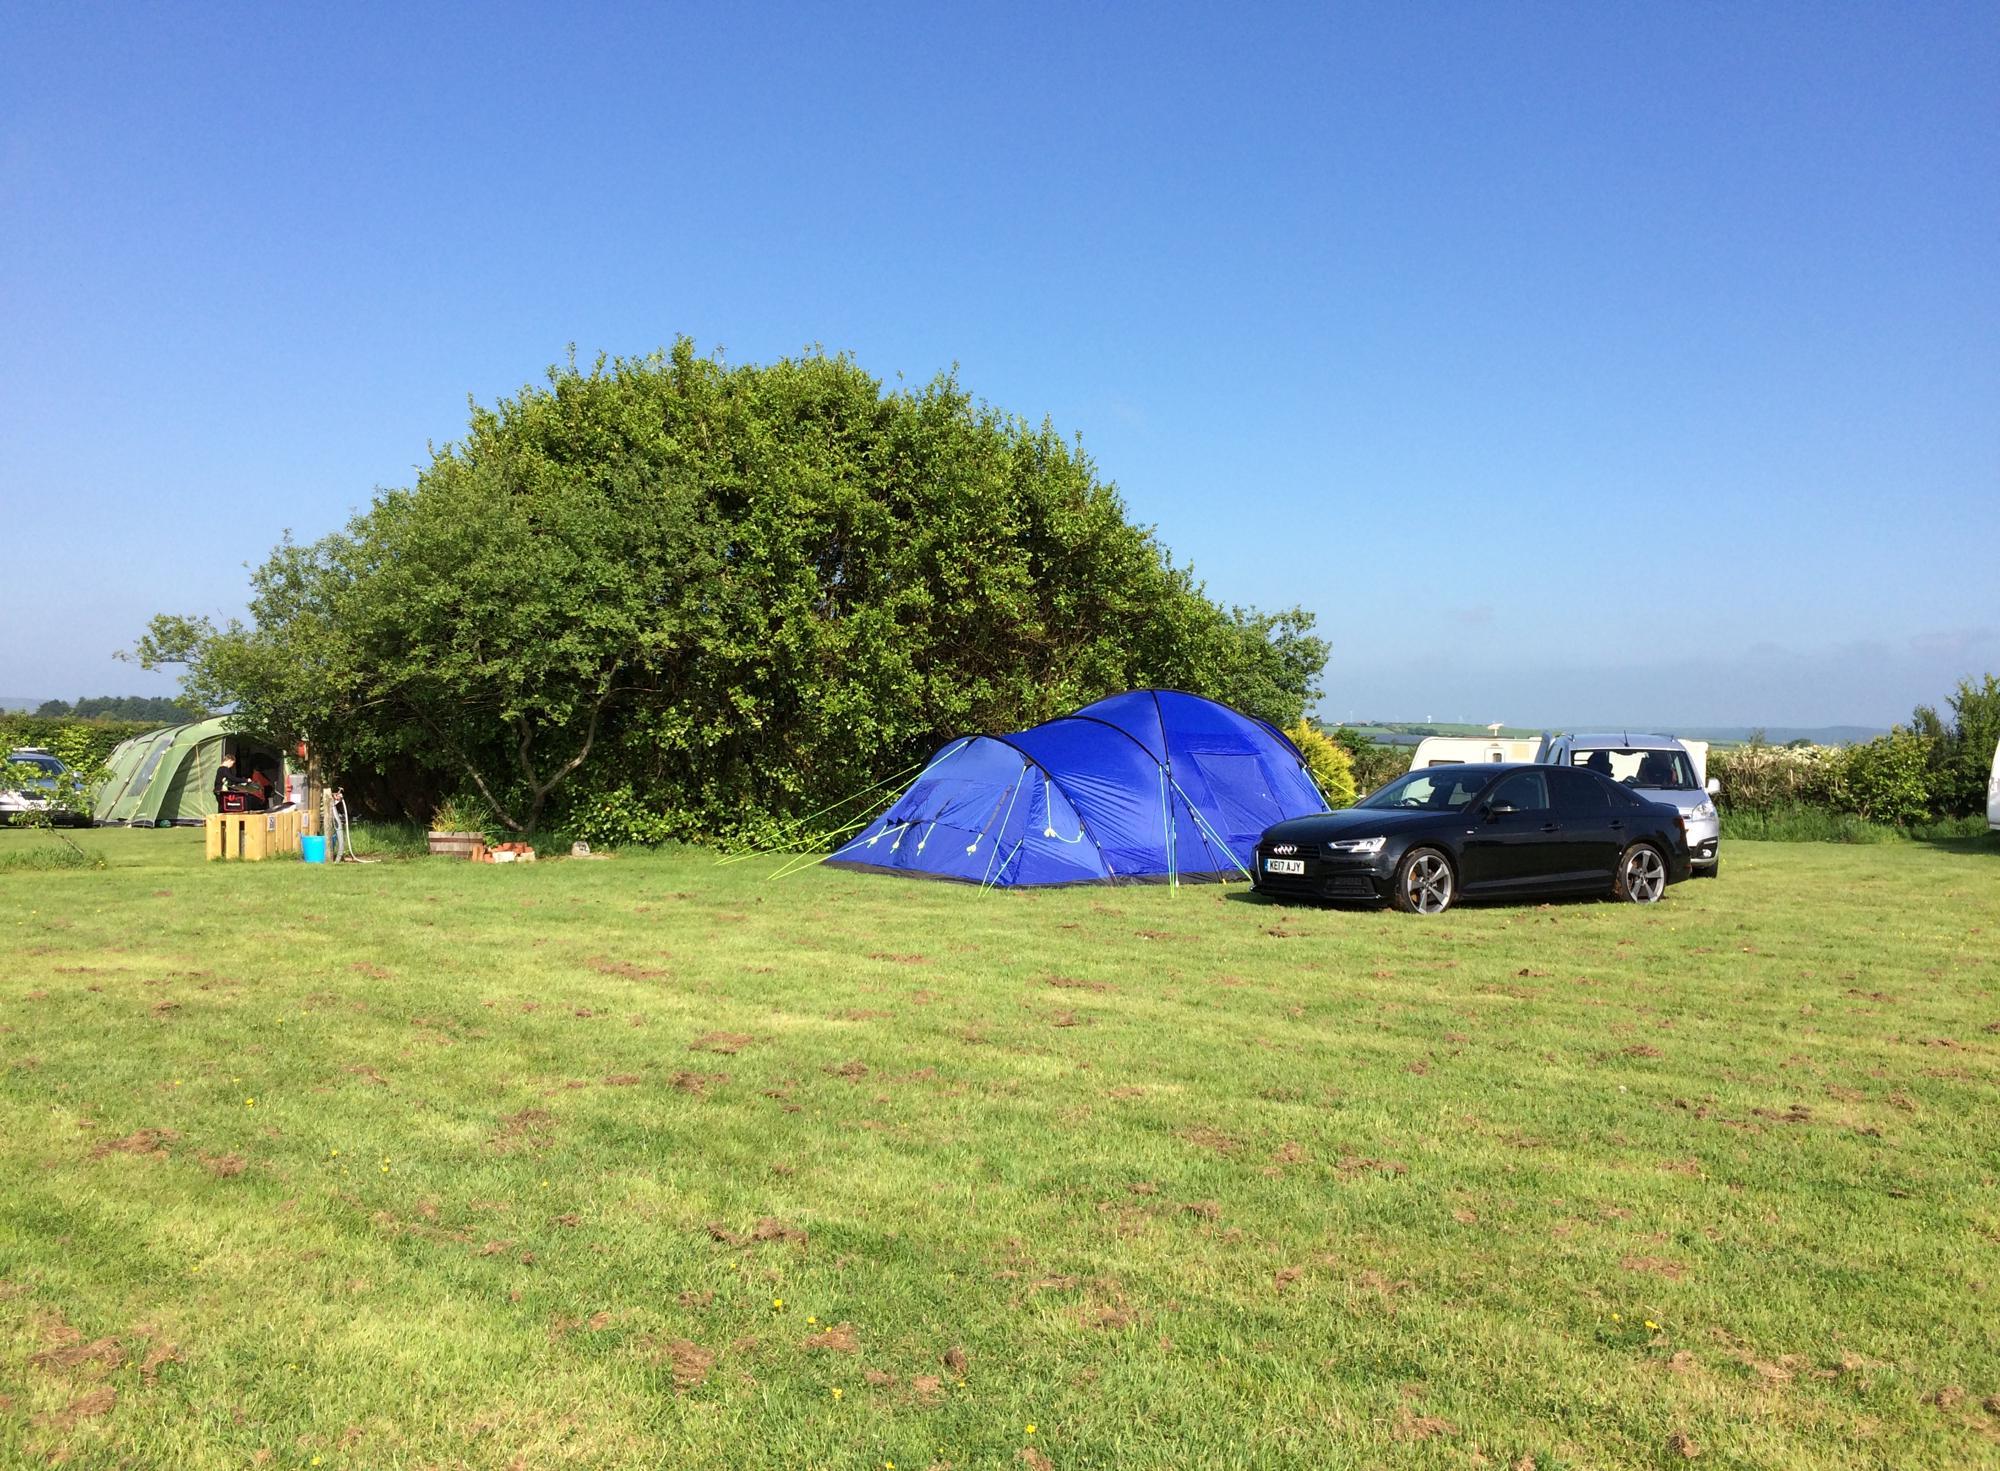 Liskeard Camping – Campsites near Liskeard, Cornwall